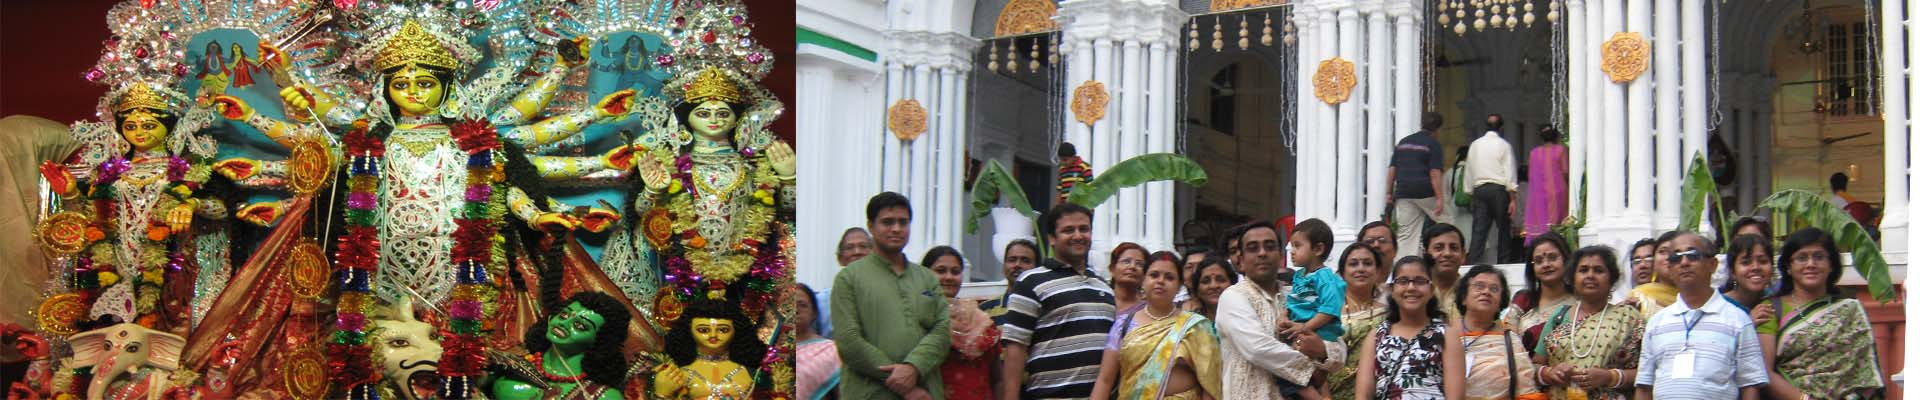 Durga Puja Parikrama,Gram Banglar Durga Puja-Mercury Tour